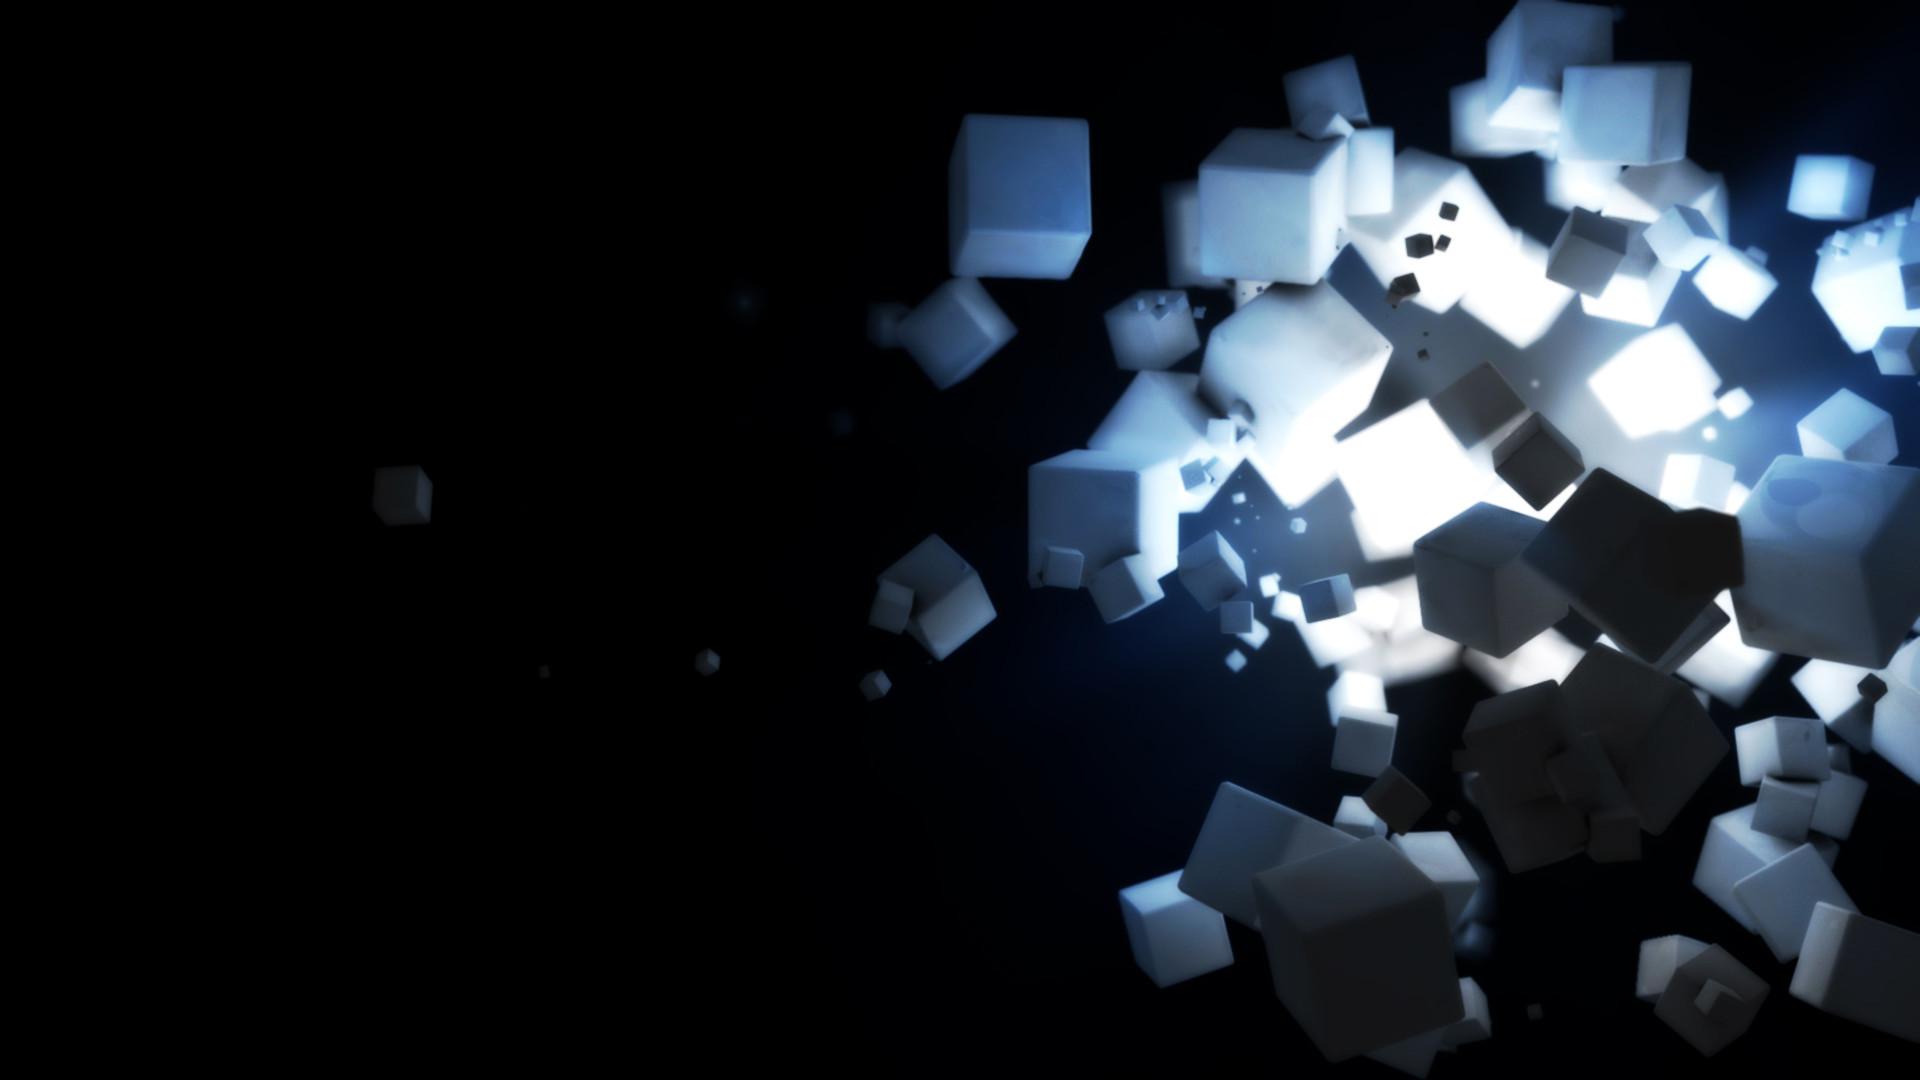 Res: 1920x1080, Tags: Dark Cubes